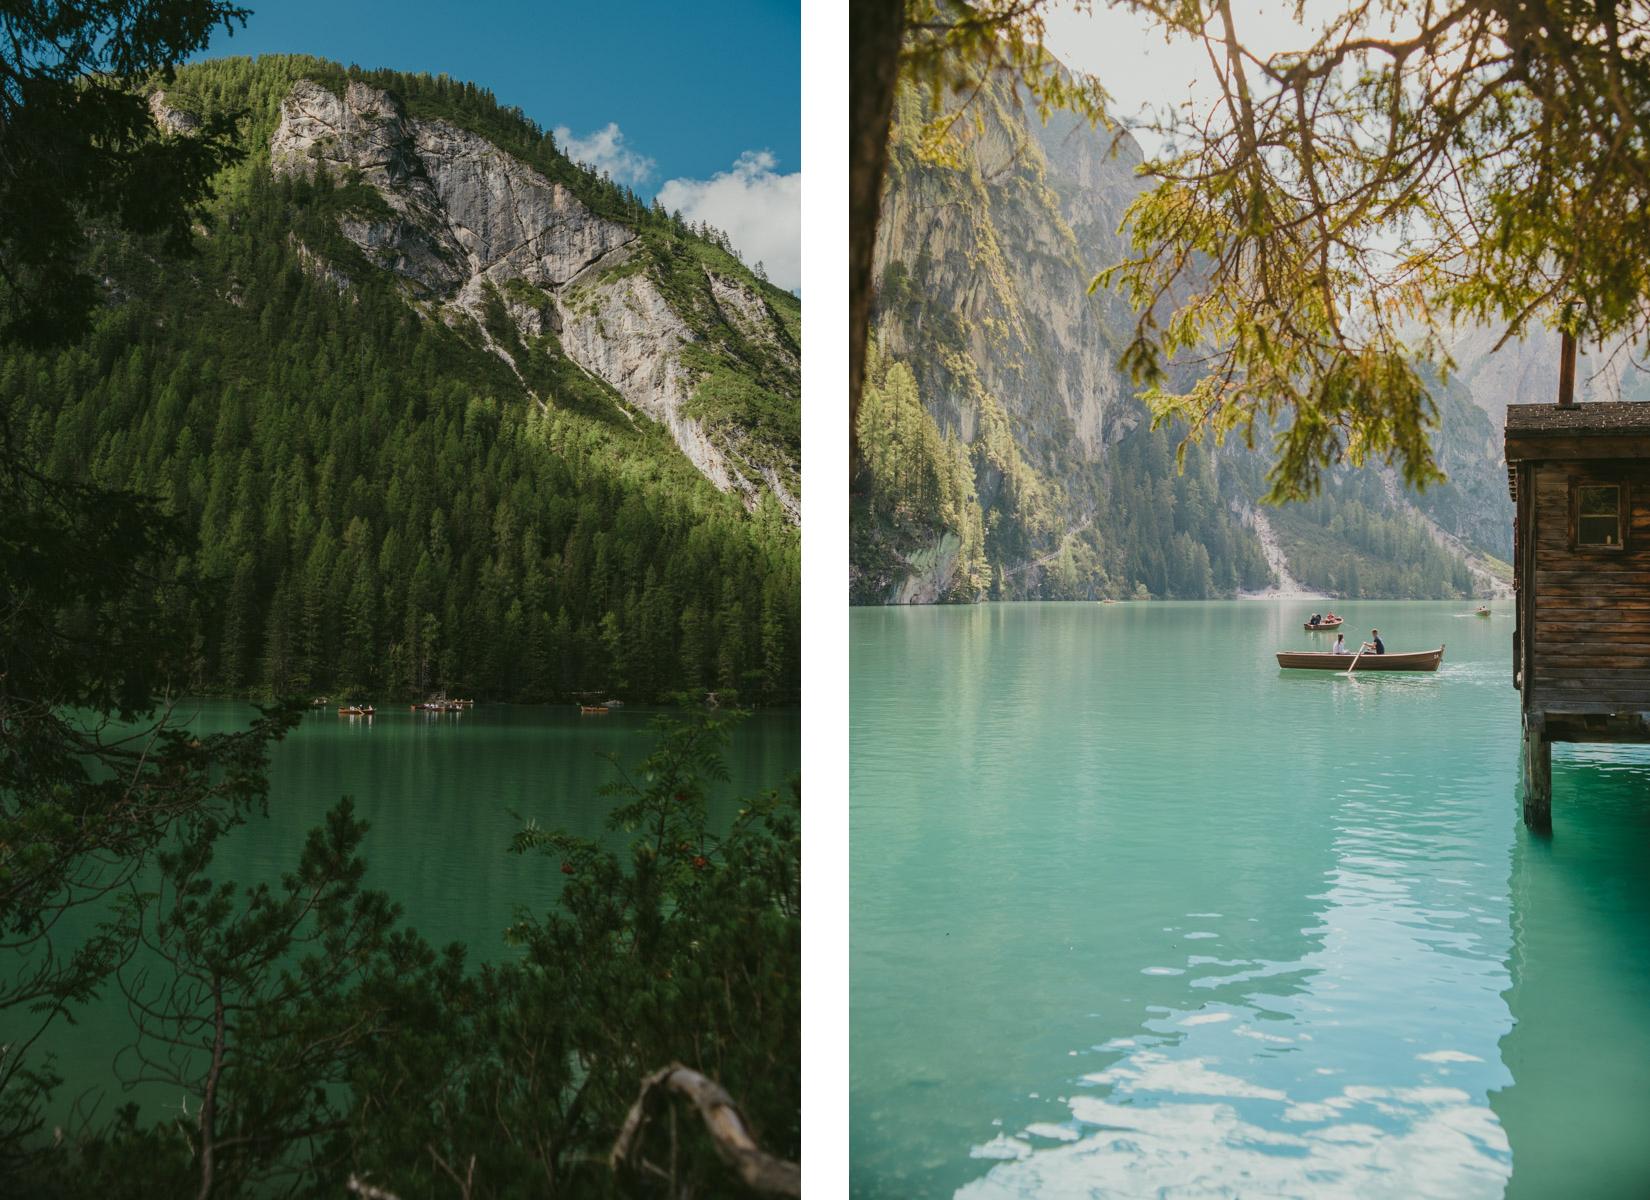 A panoramic view of Braies Lake on the Dolomites with some little boat floating on it ; una veduta panoramica del lago di Braies con piccole barche sullo sfondo